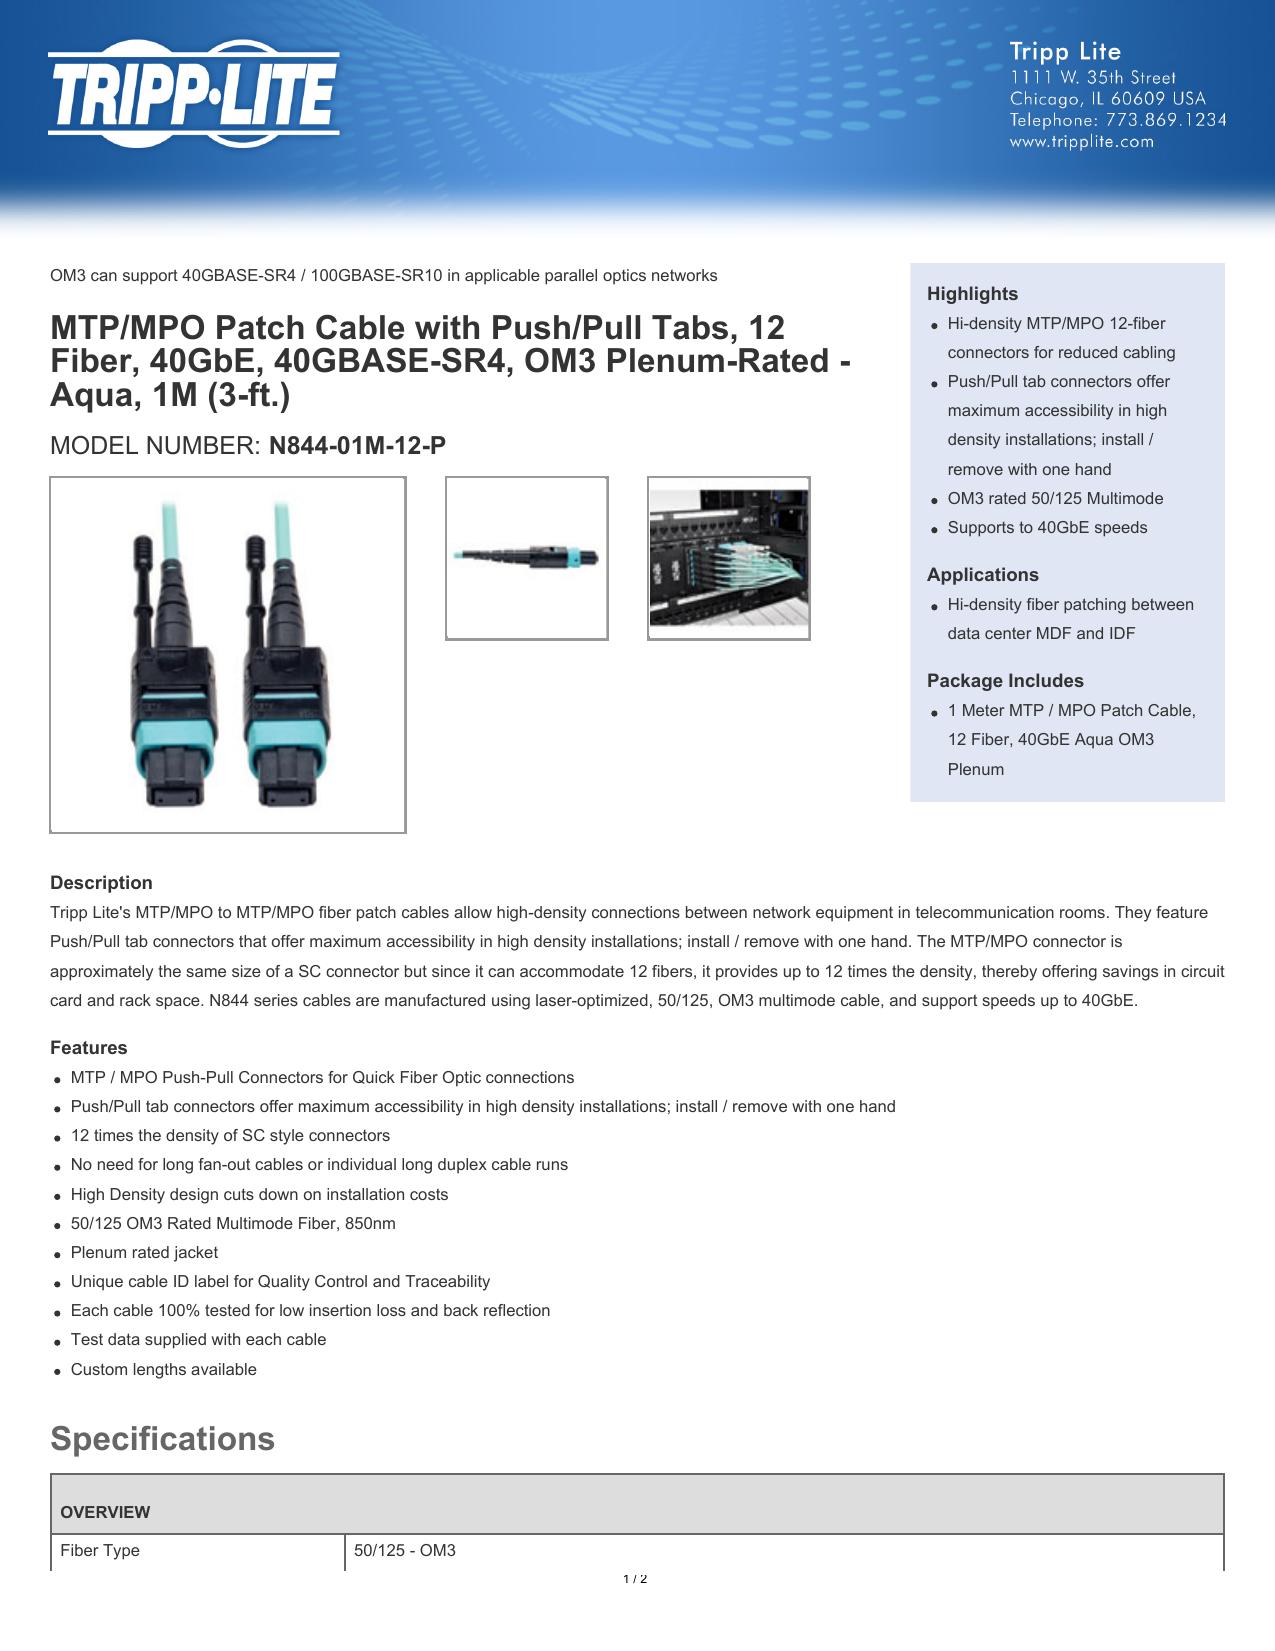 1M 3-ft. CXP 24 Fiber Tripp Lite MTP // MPO Patch Cable 100GBASE-SR10 Aqua 100GbE OM3 Plenum-rated N846-01M-24-P